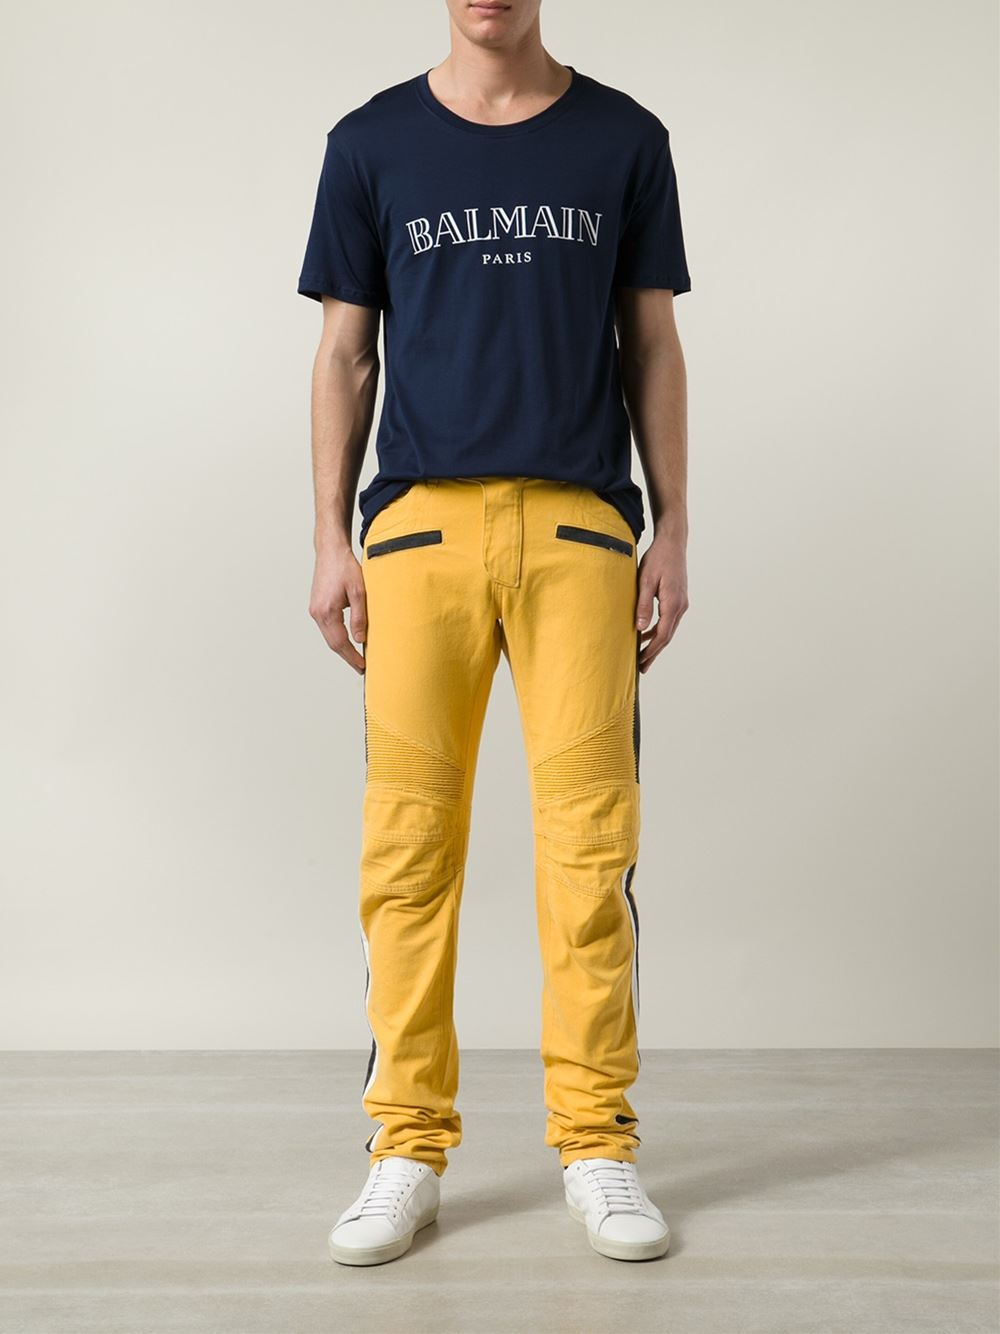 bcfe0885 Balmain Straight Leg Biker Jeans in Yellow for Men - Lyst